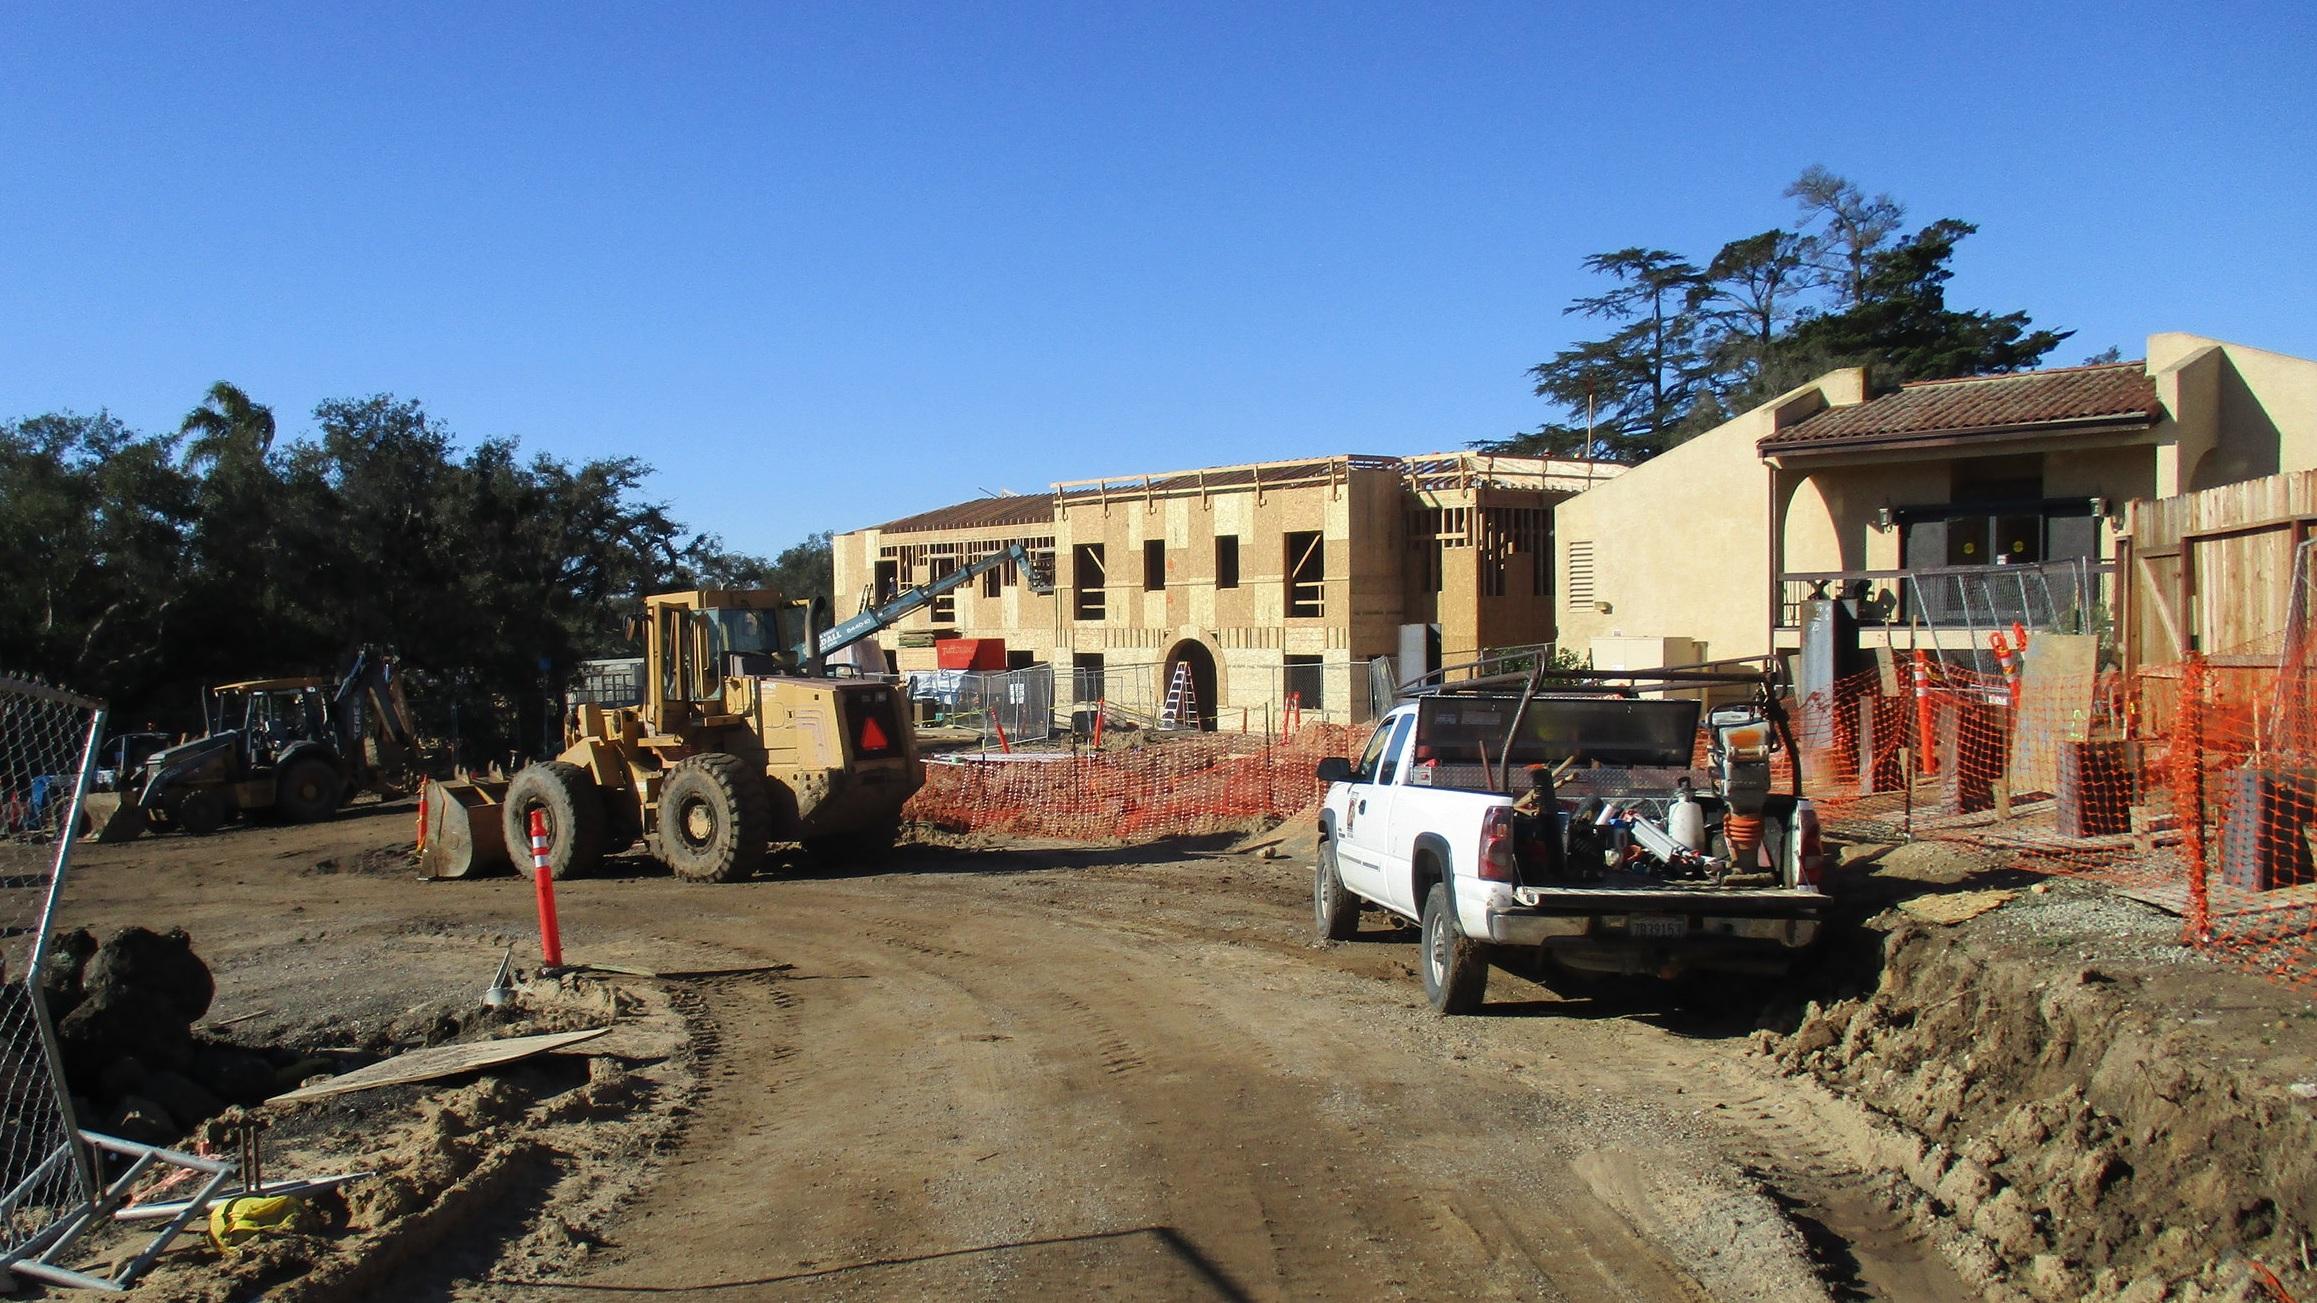 Casa Dorinda, Primary Care Unit, 3/11/19 Sitework at IL and PCU Roughins continue